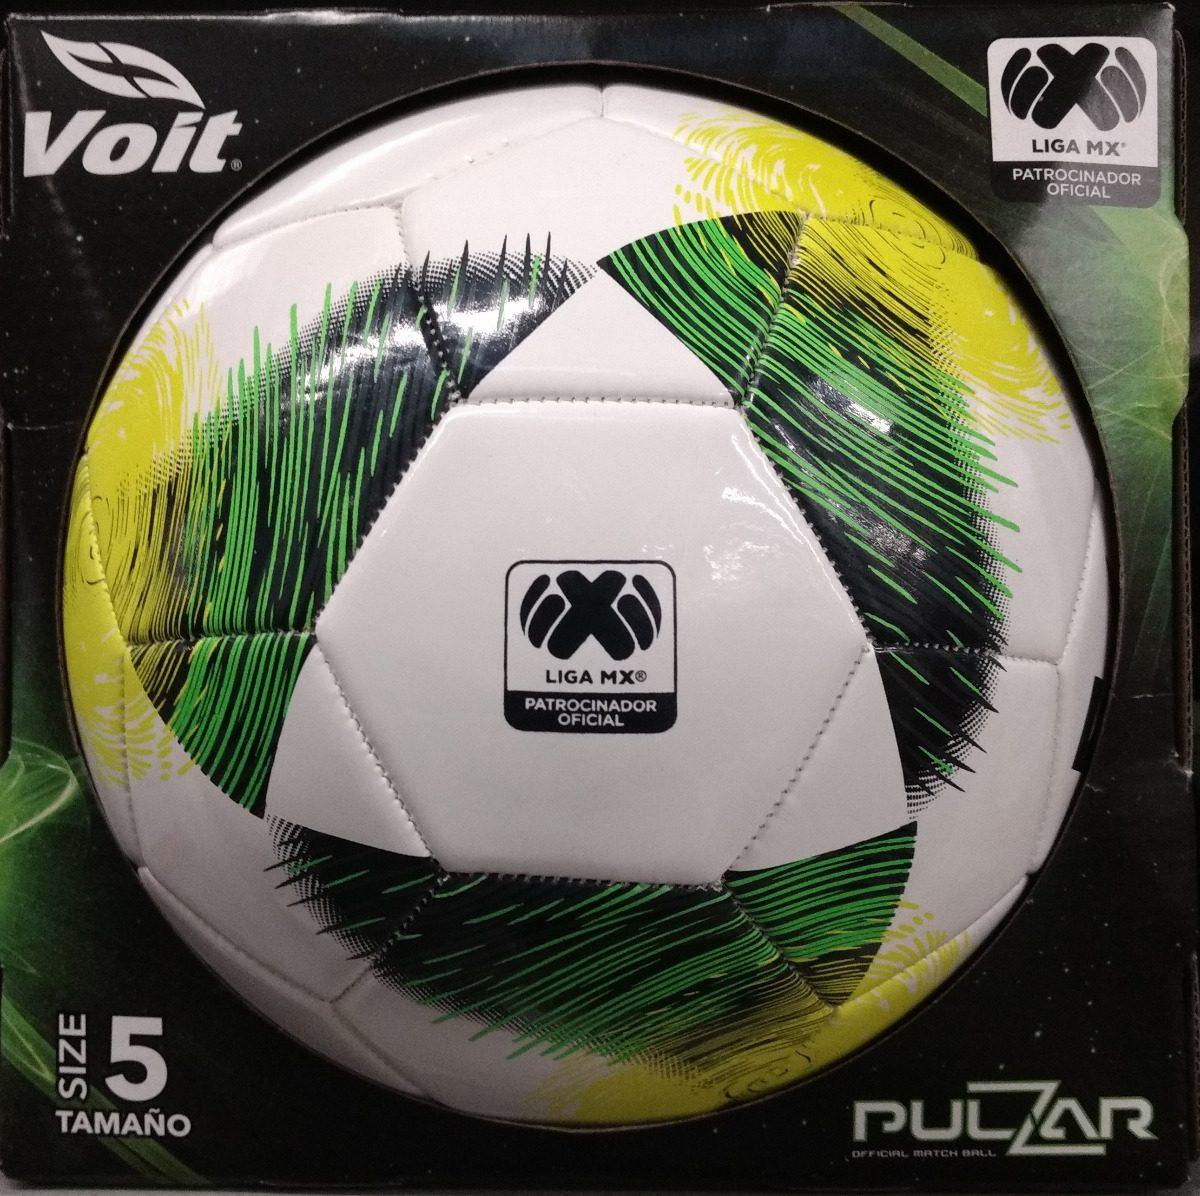 Balon Futbol Liga Mx Clausura 2019 Tam 5 Voit Pulzar -   525.00 en ... 877e4bc1c1854